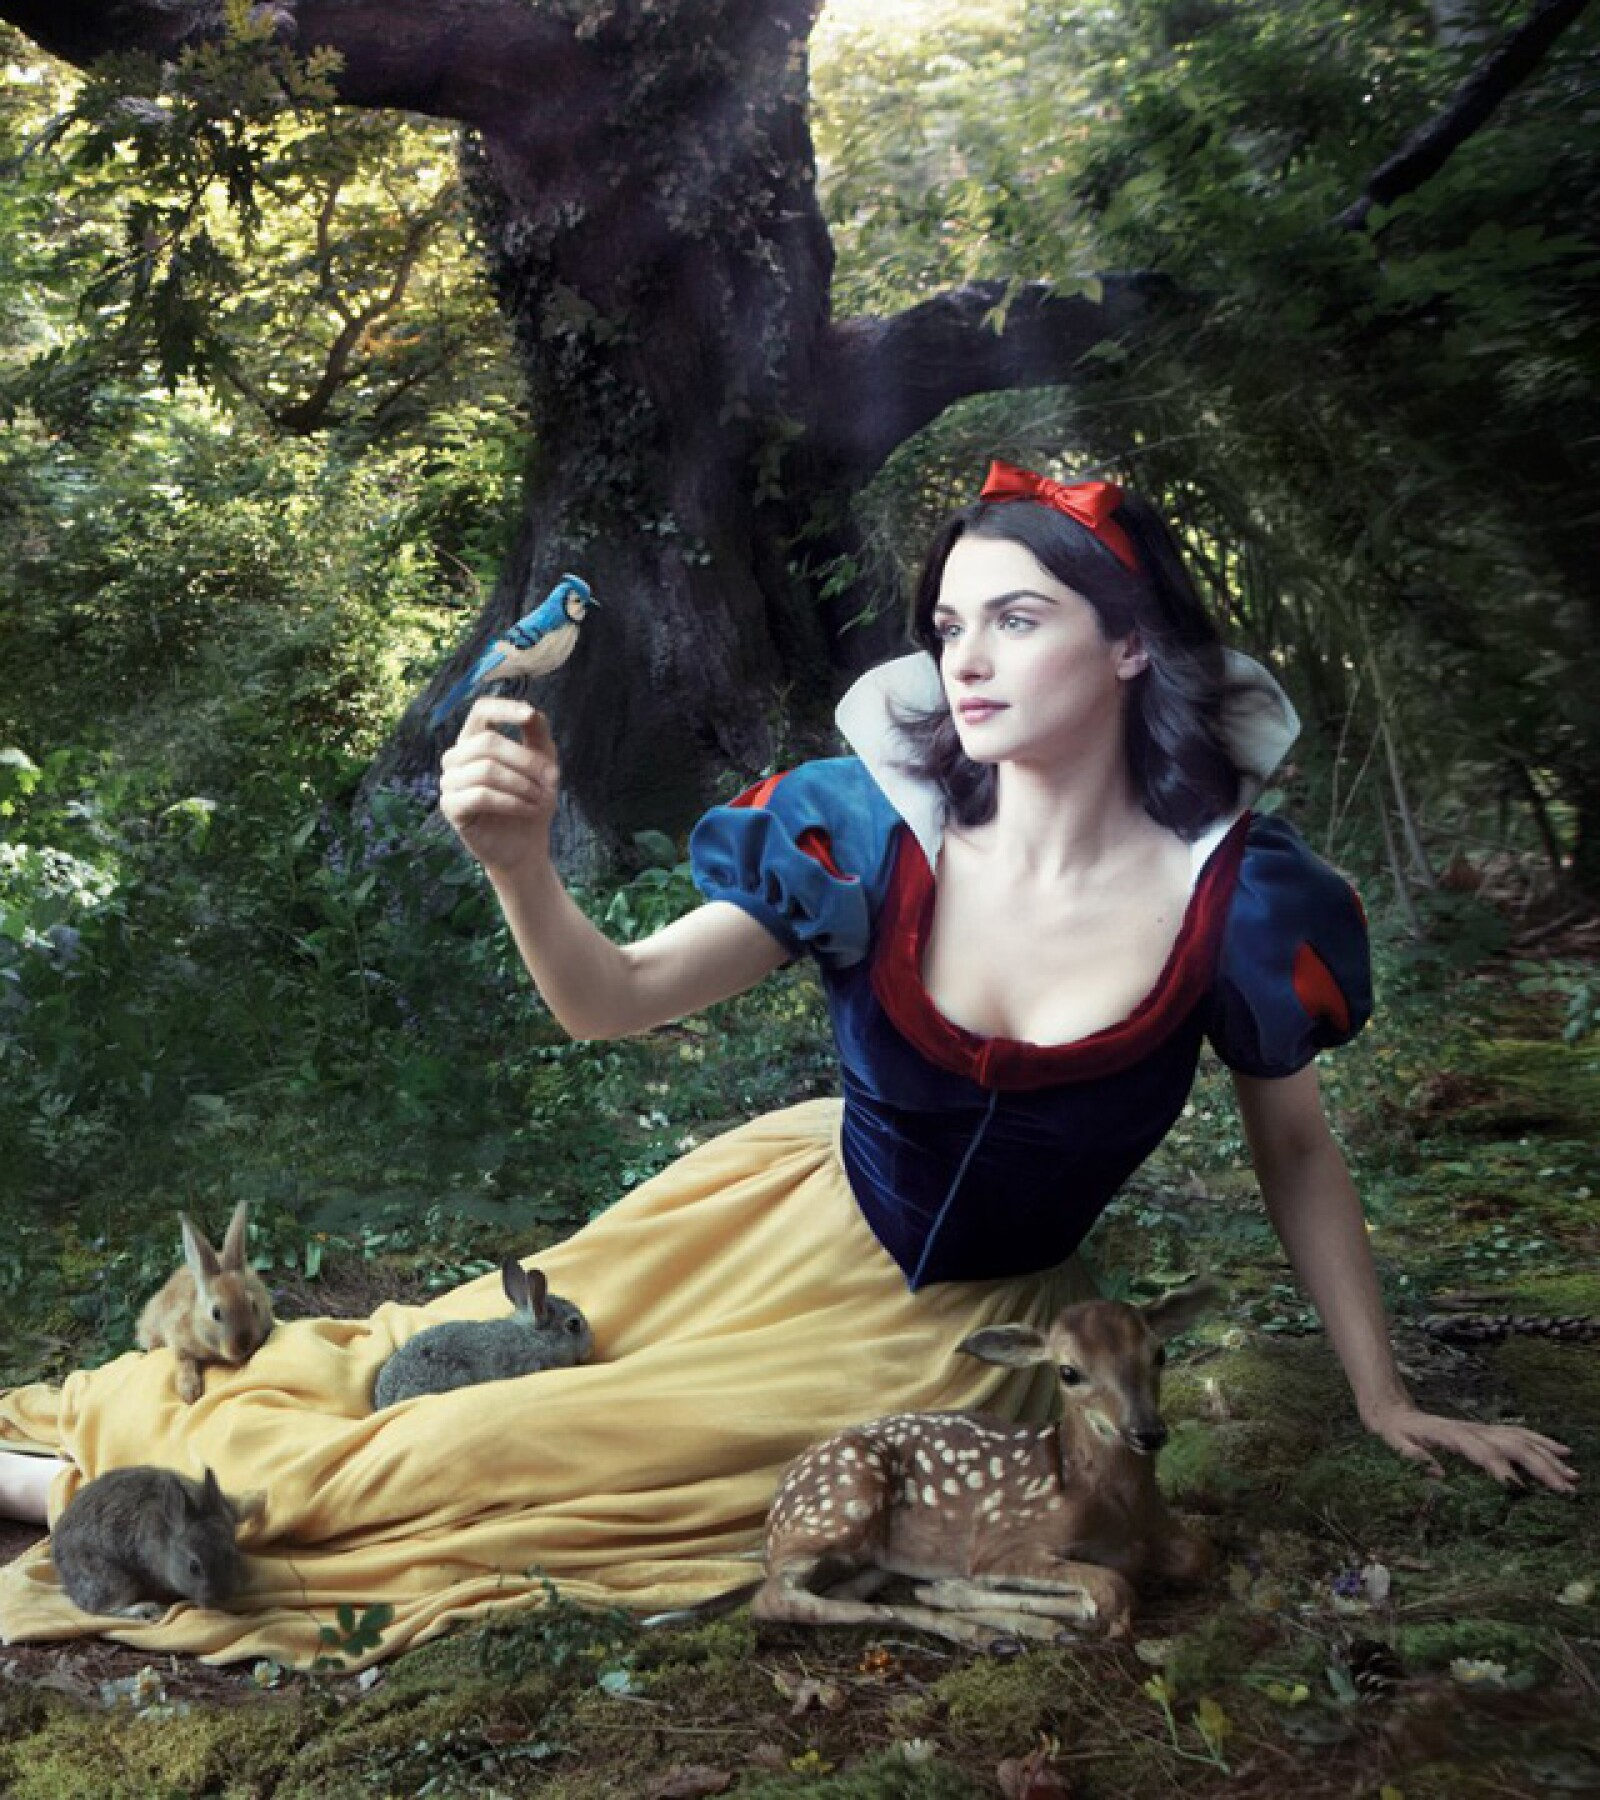 Rachel Weisz dio vida a la inocente Snow White